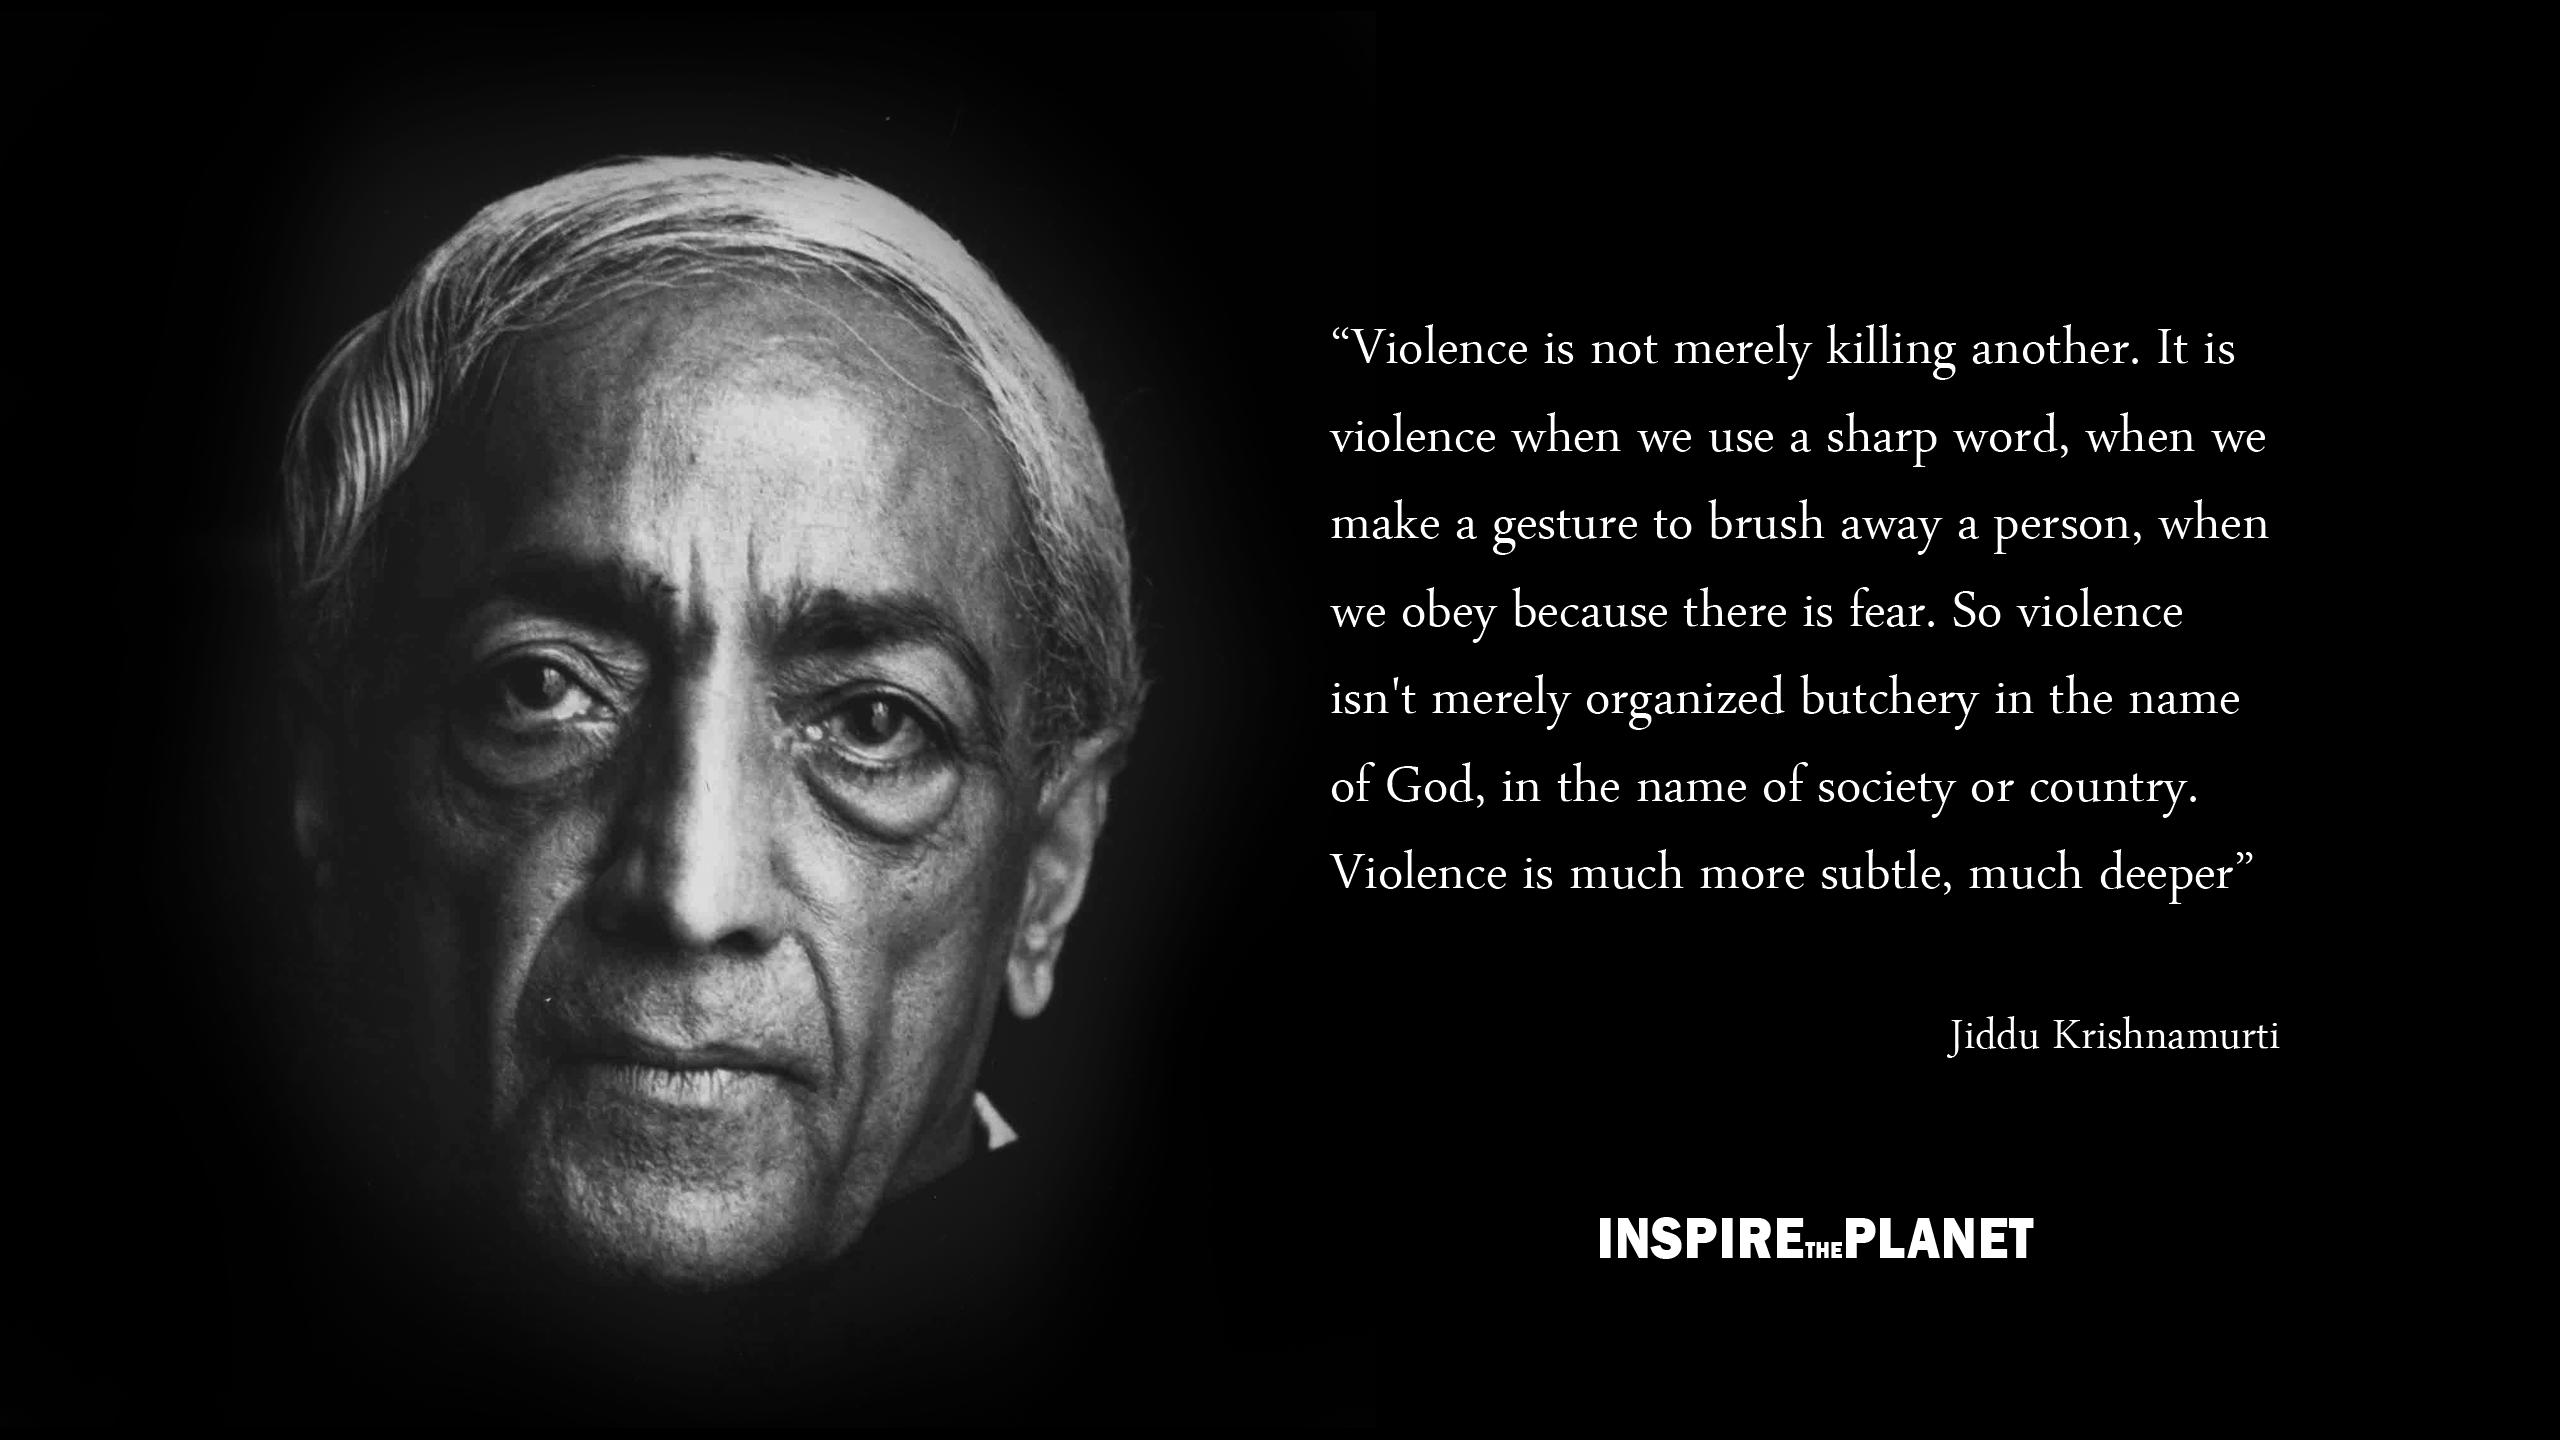 Jiddu Krishnamurti's quote #1